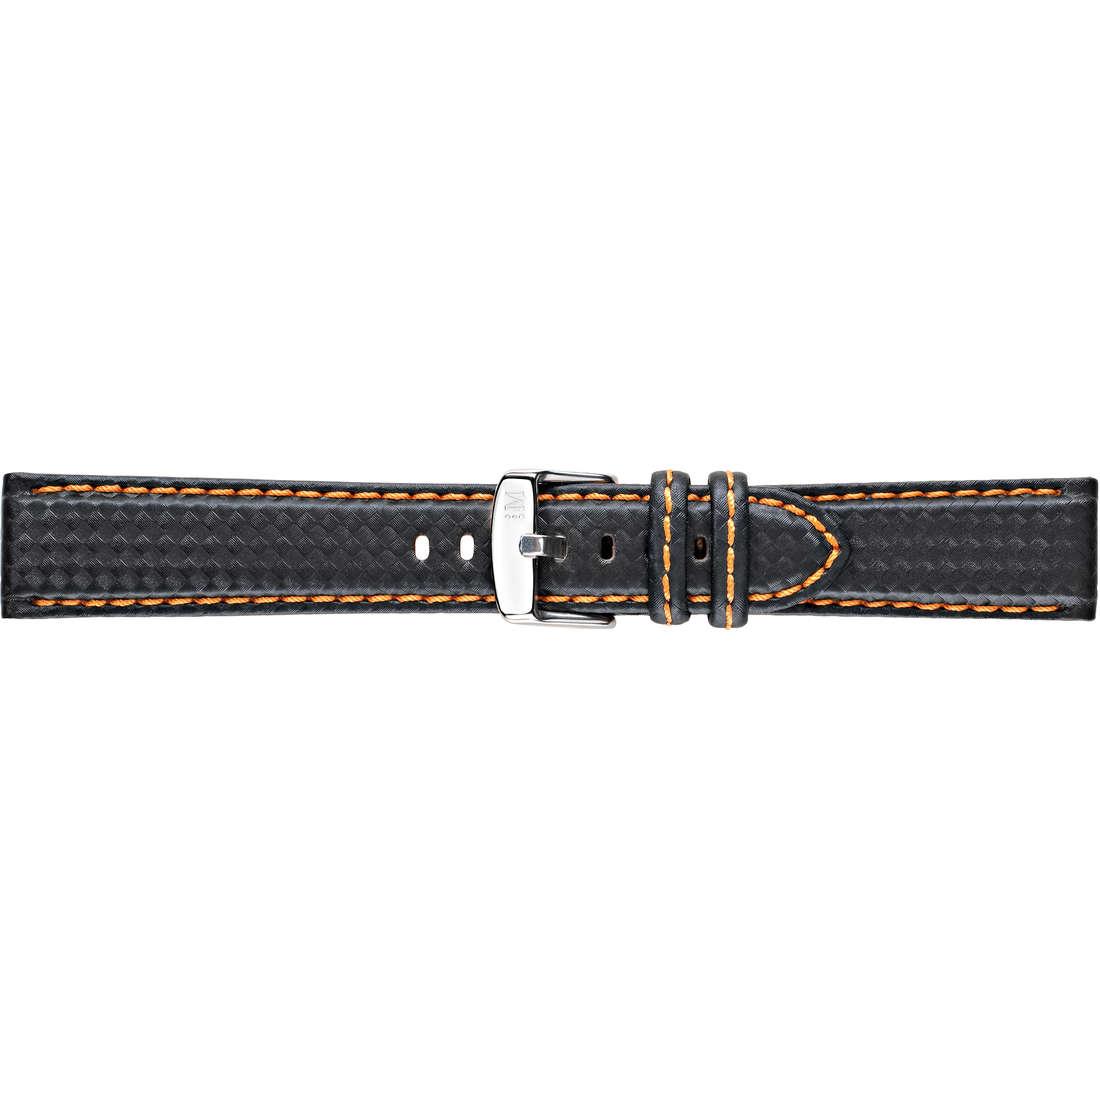 montre bande de montres homme Morellato Linea Sport A01U3586977886CR20